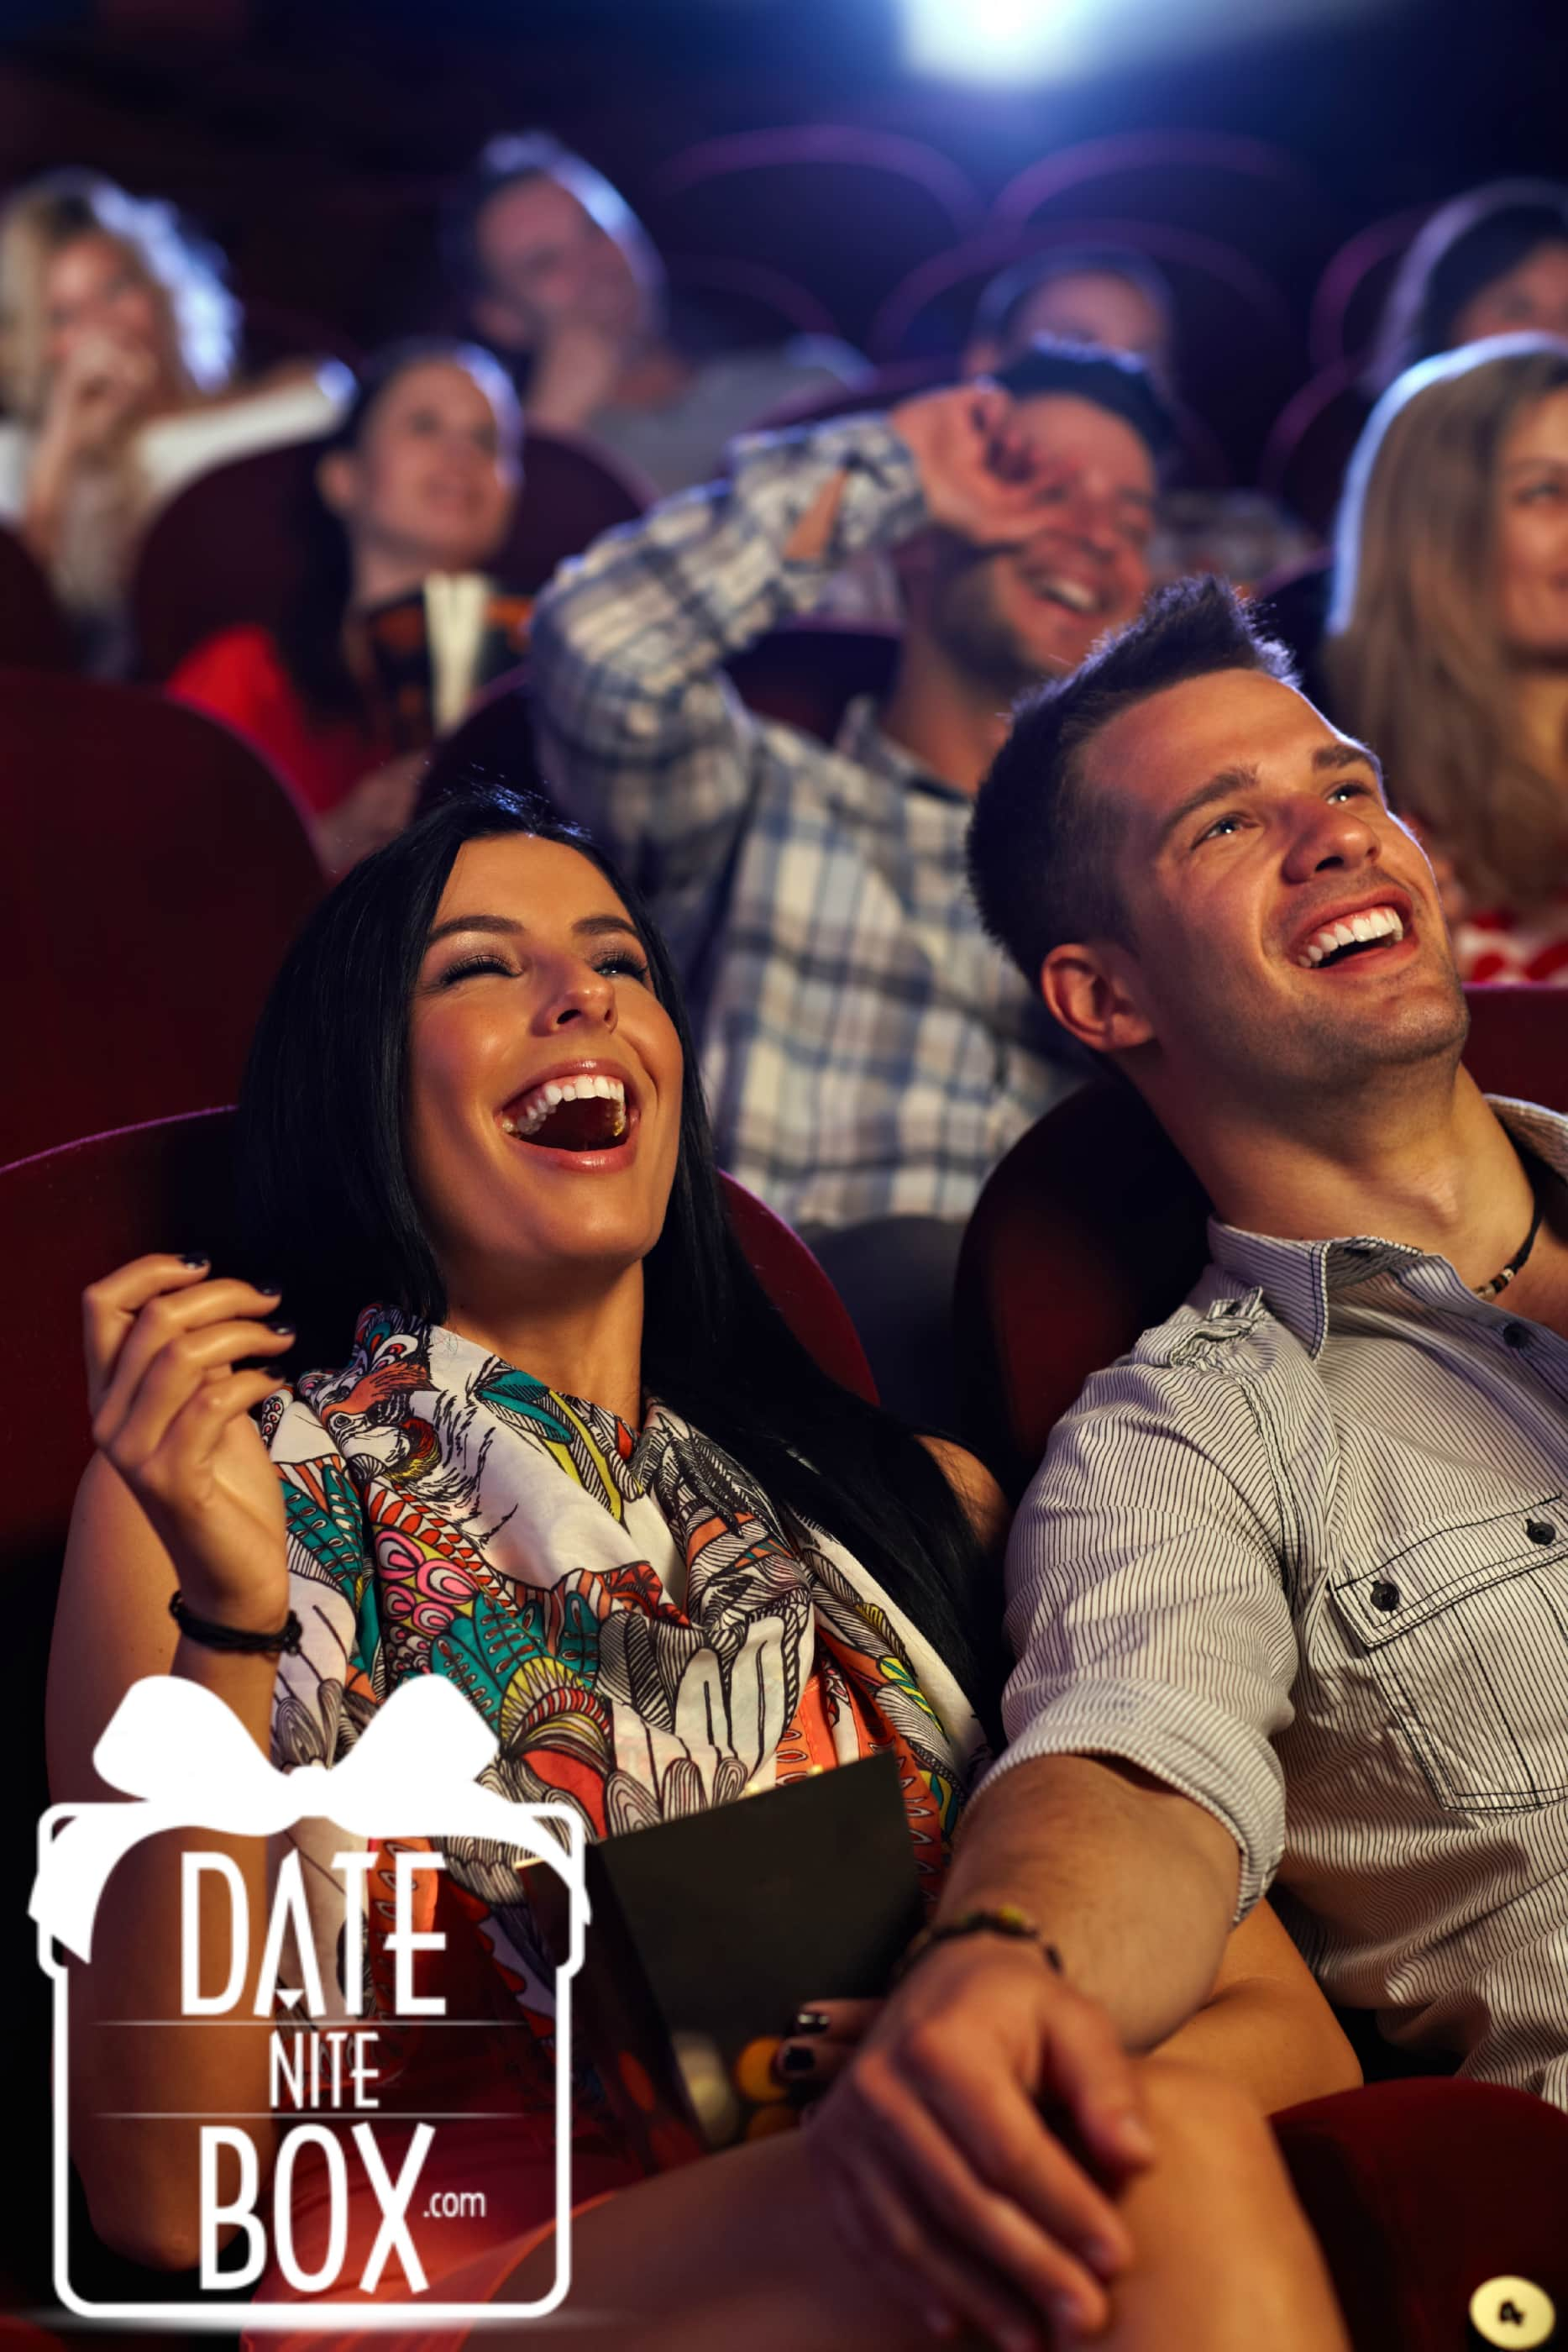 Movie date nite